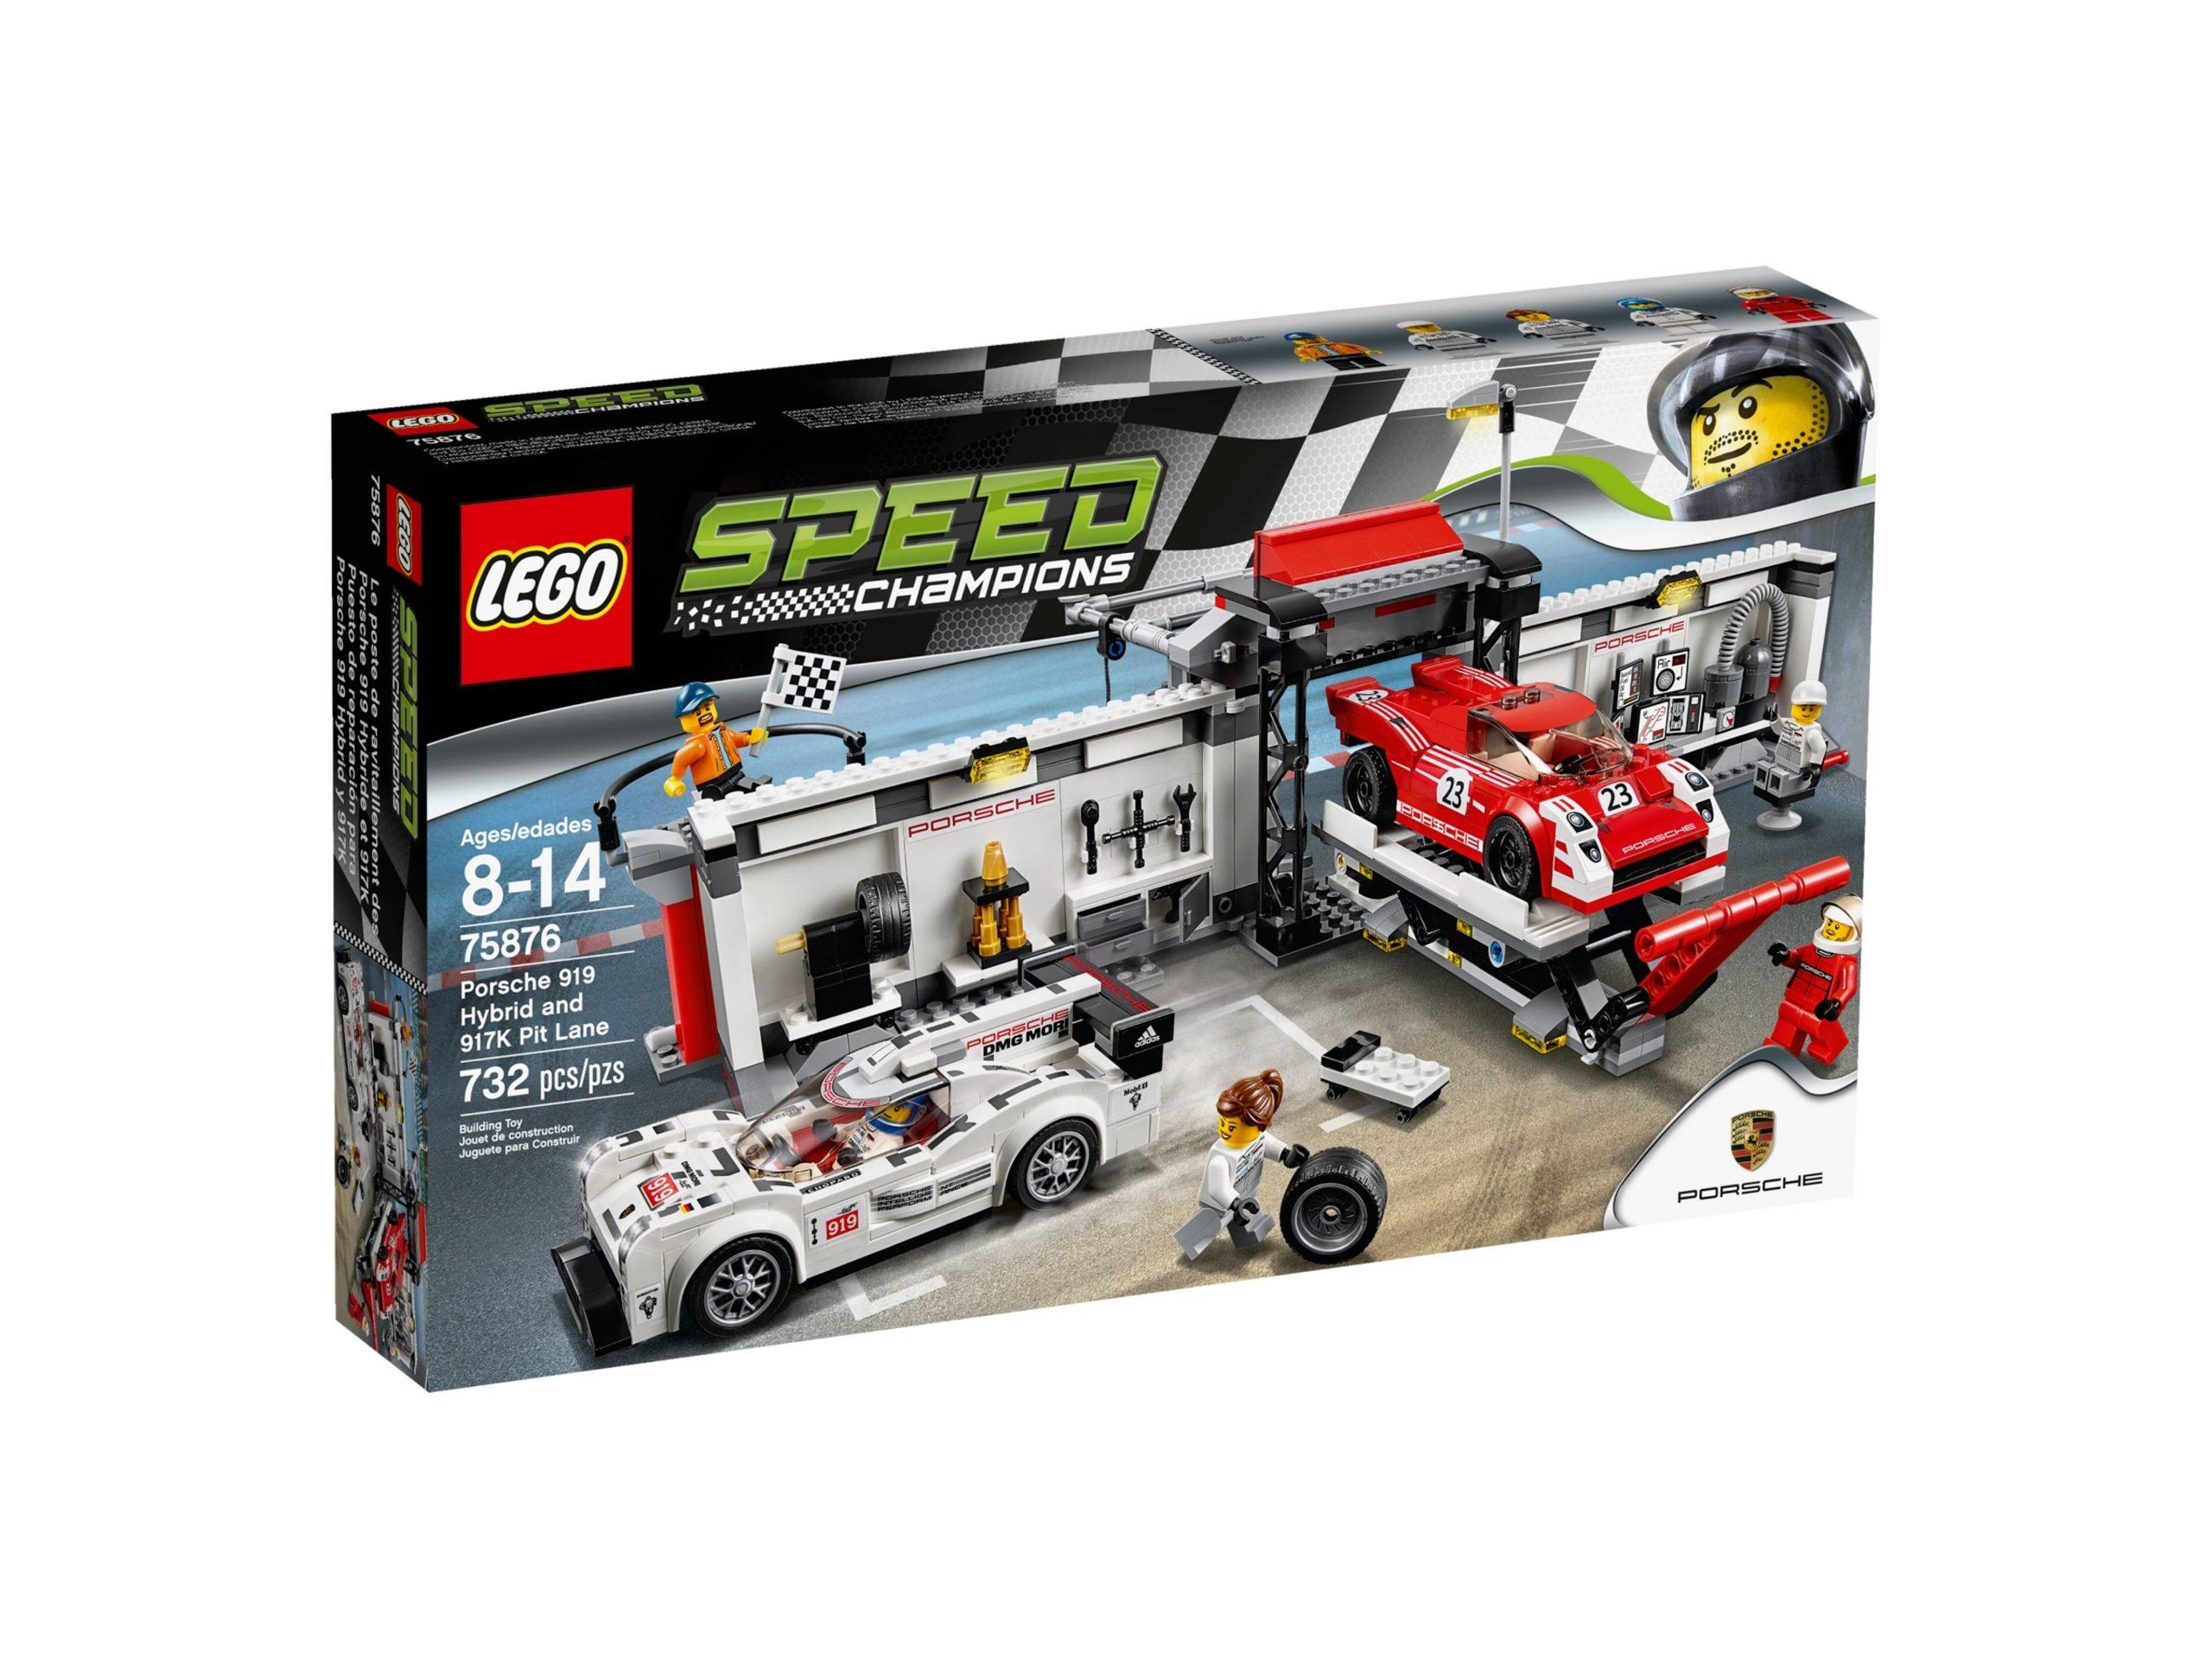 lego 75876 porsche 919 hybrid and 917k pit lane scaled